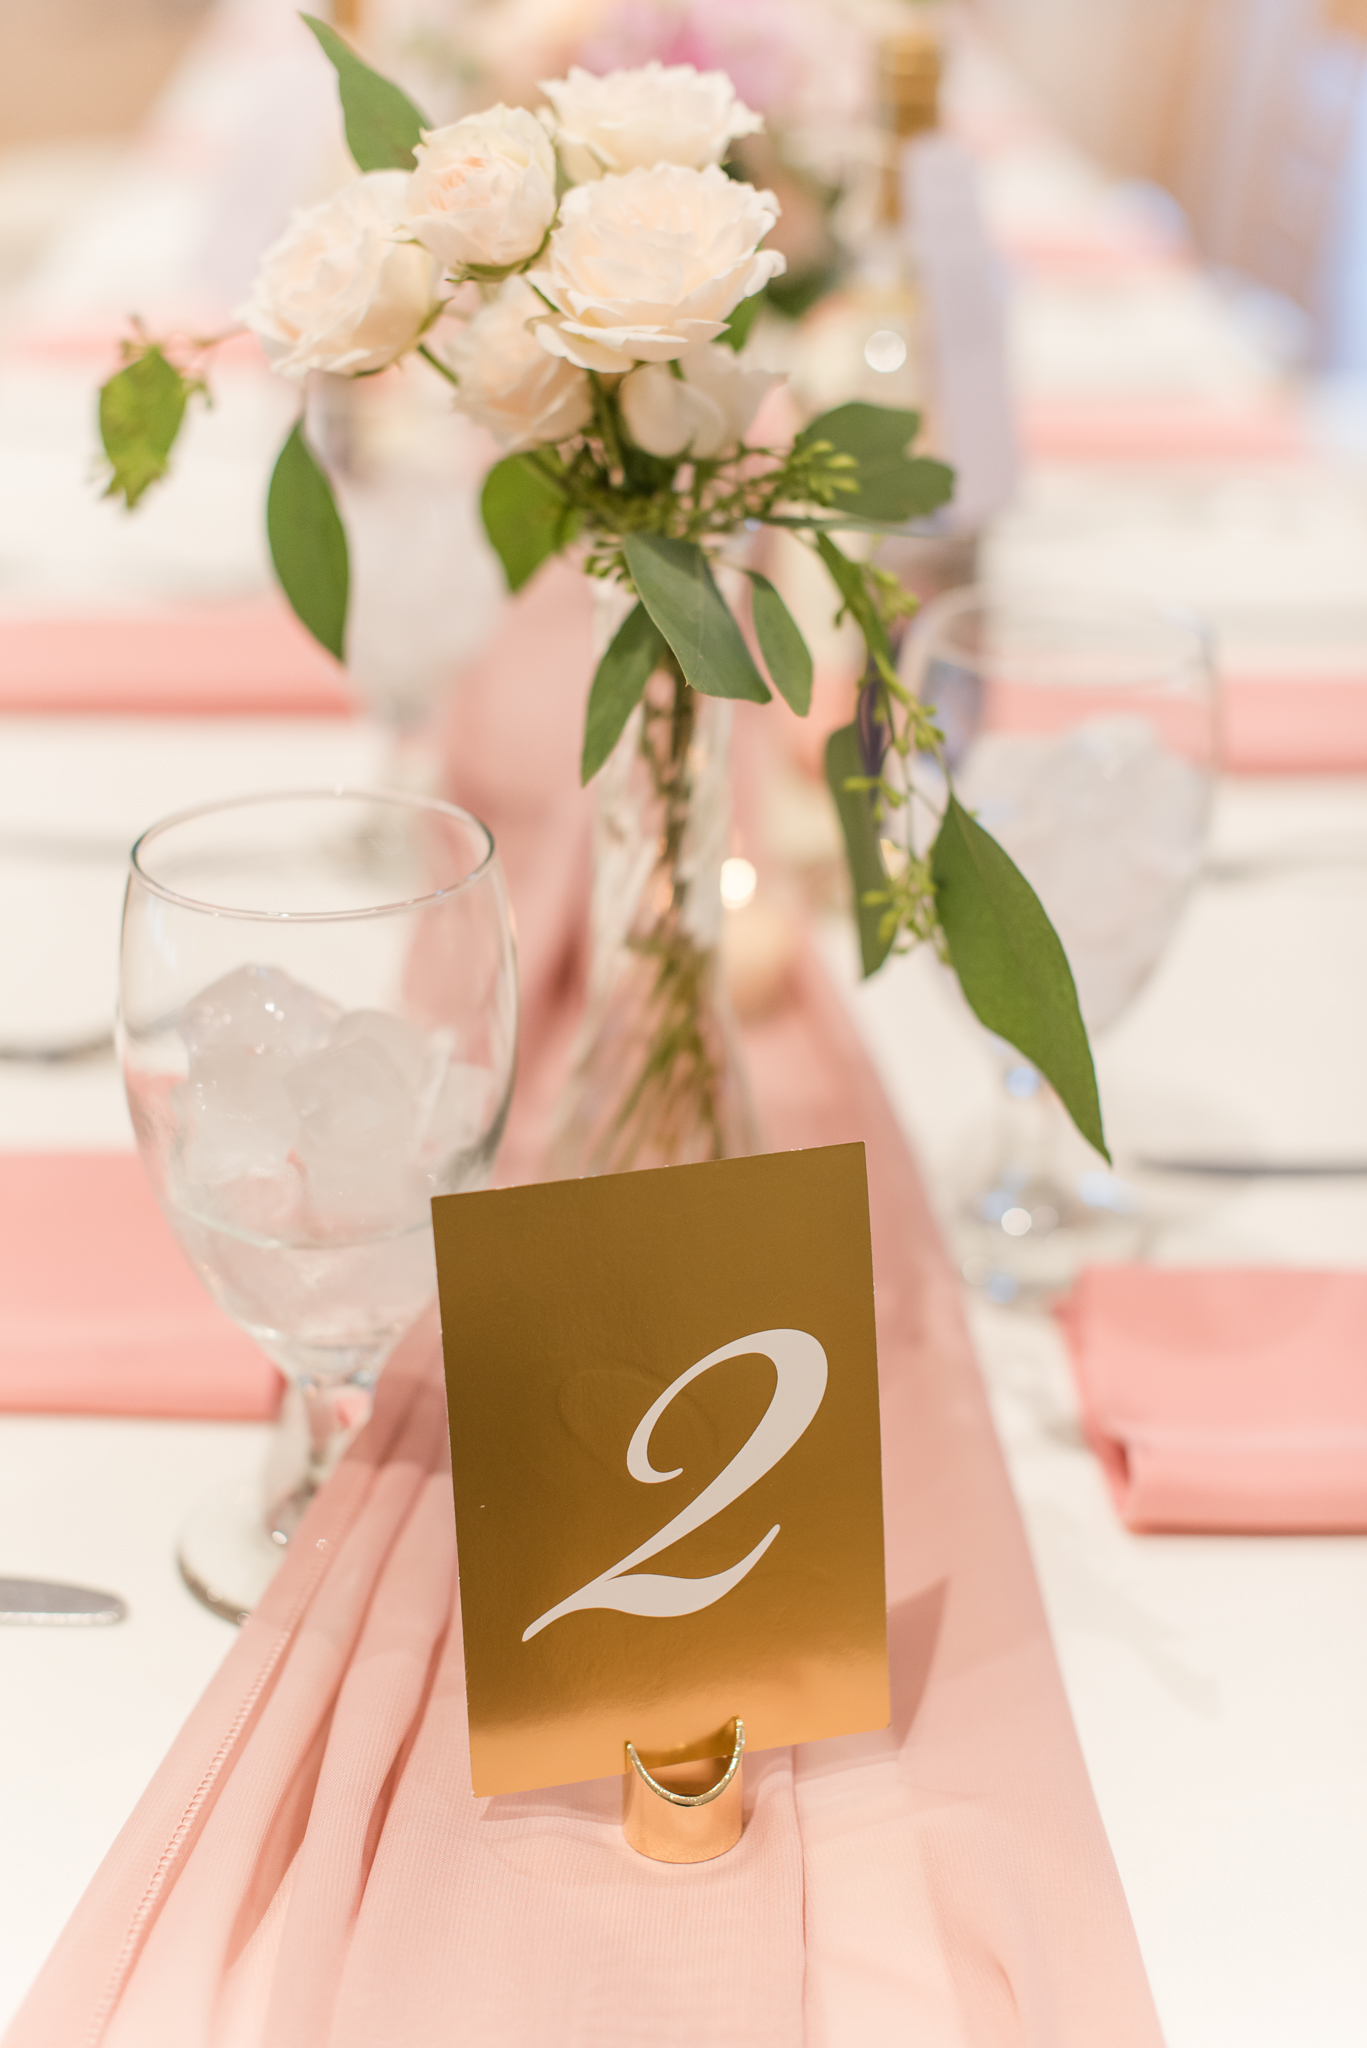 Sycamore at Mallow Run Wedding6259.jpg